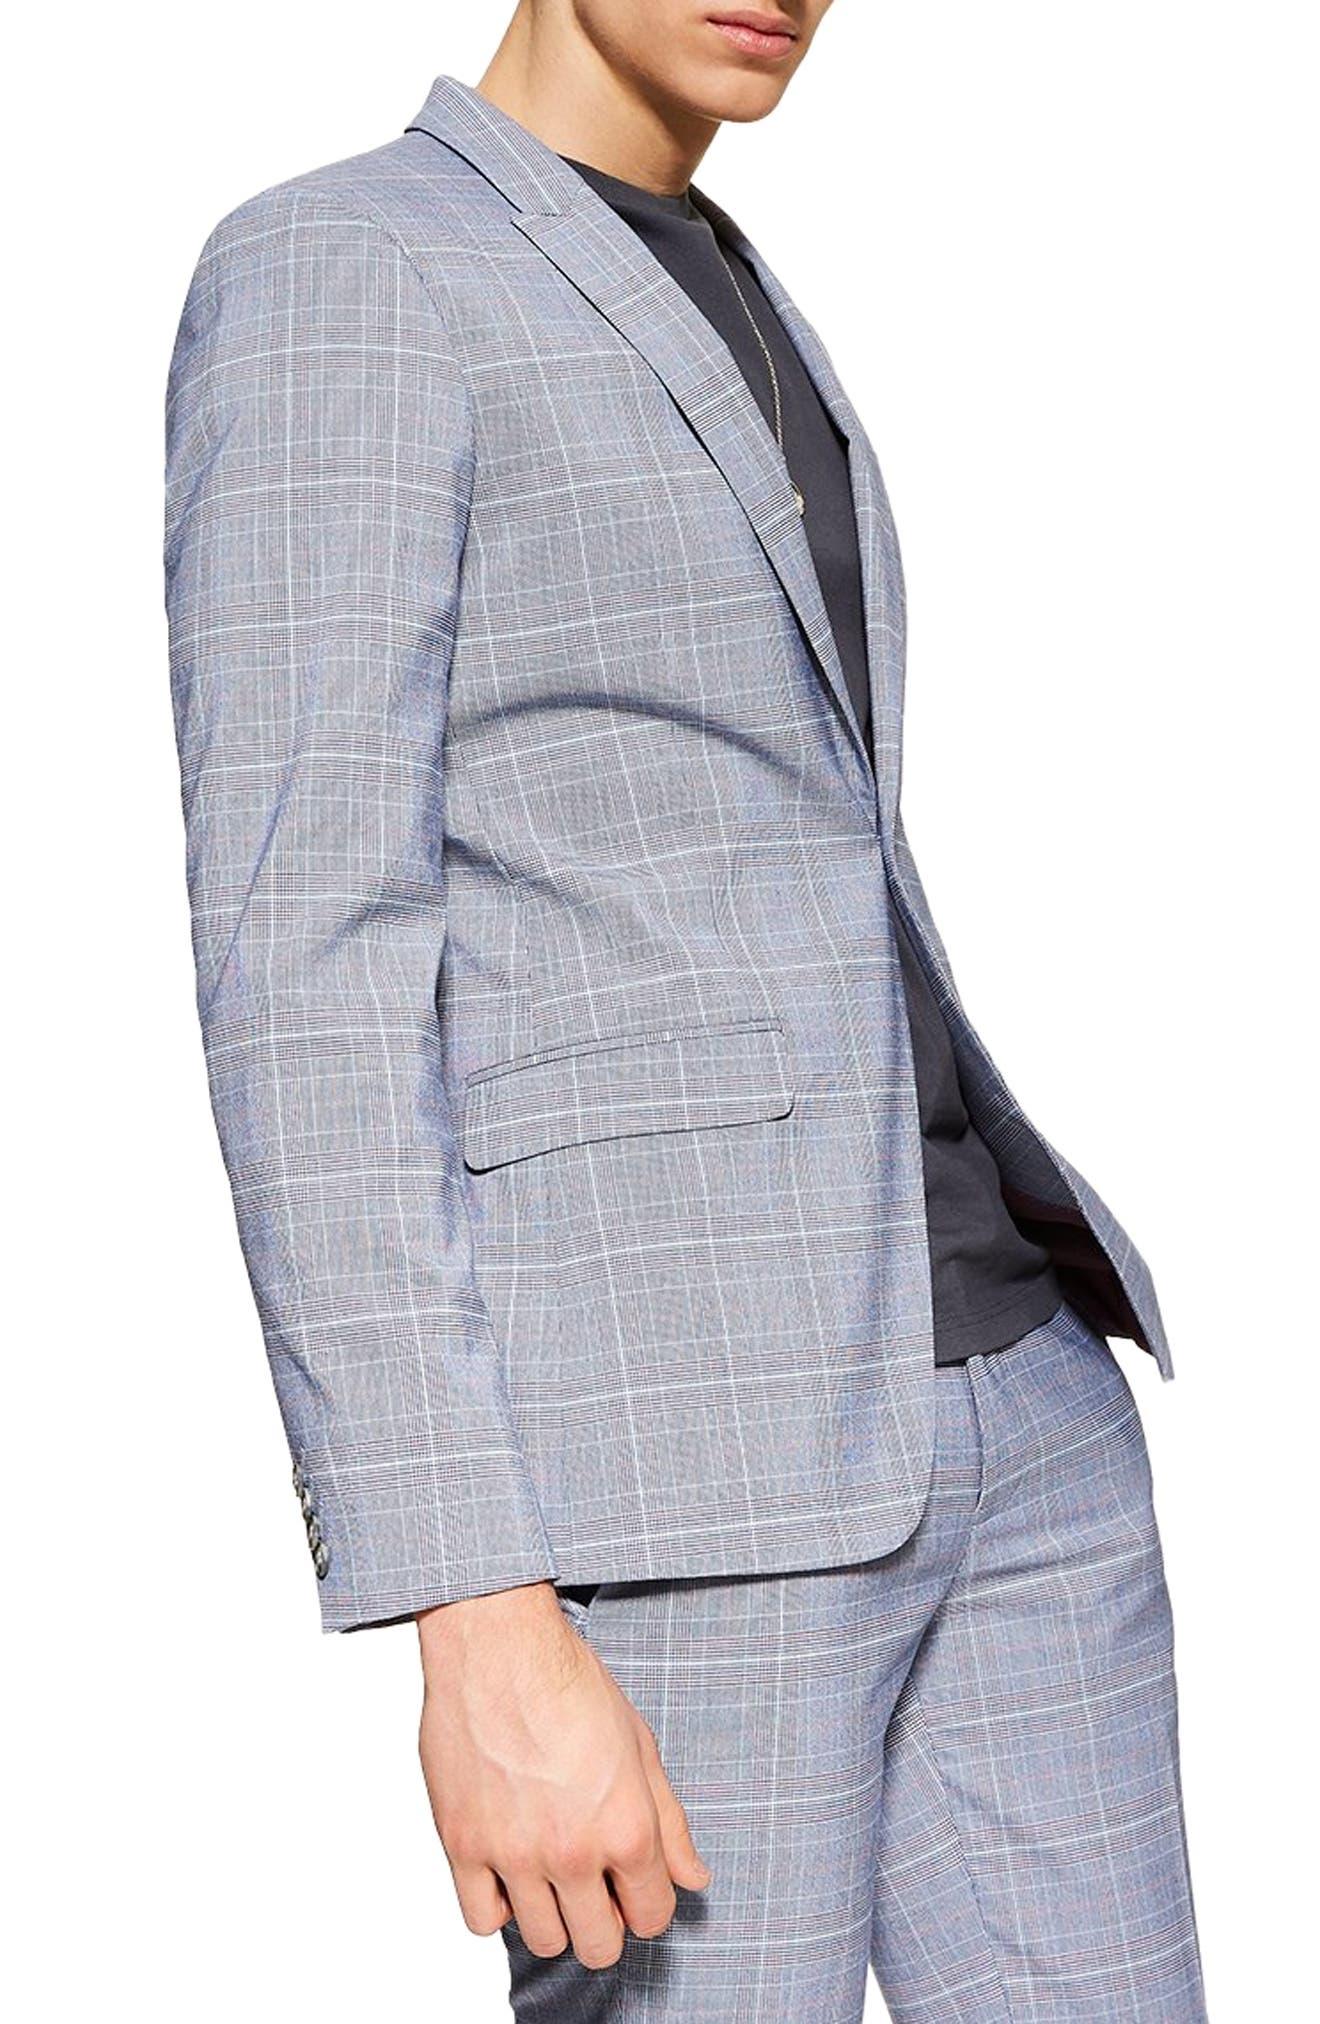 TOPMAN, Skinny Fit Suit Jacket, Main thumbnail 1, color, BLUE MULTI